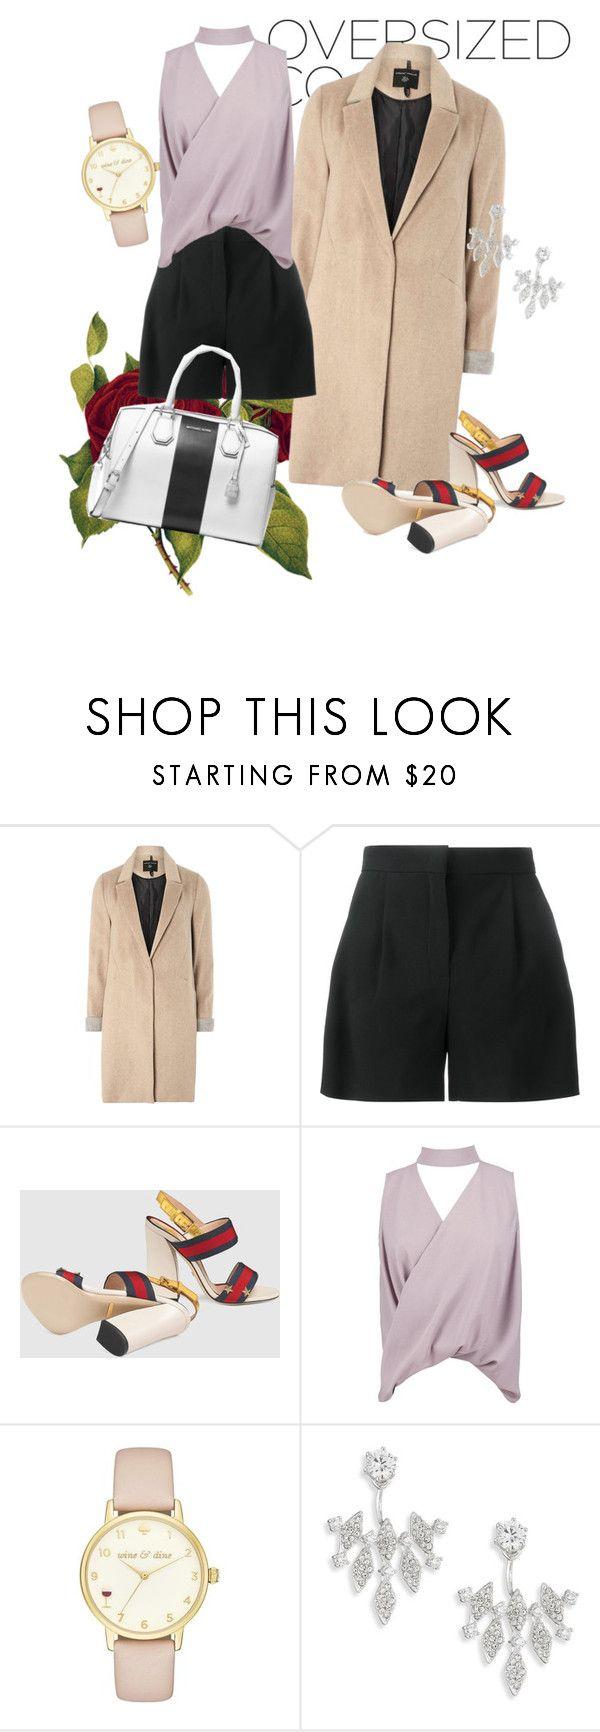 """outfit#90"" by alifia-fae on Polyvore featuring mel, Alberta Ferretti, Gucci, Boohoo, Kate Spade, Adriana Orsini and MICHAEL Michael Kors"